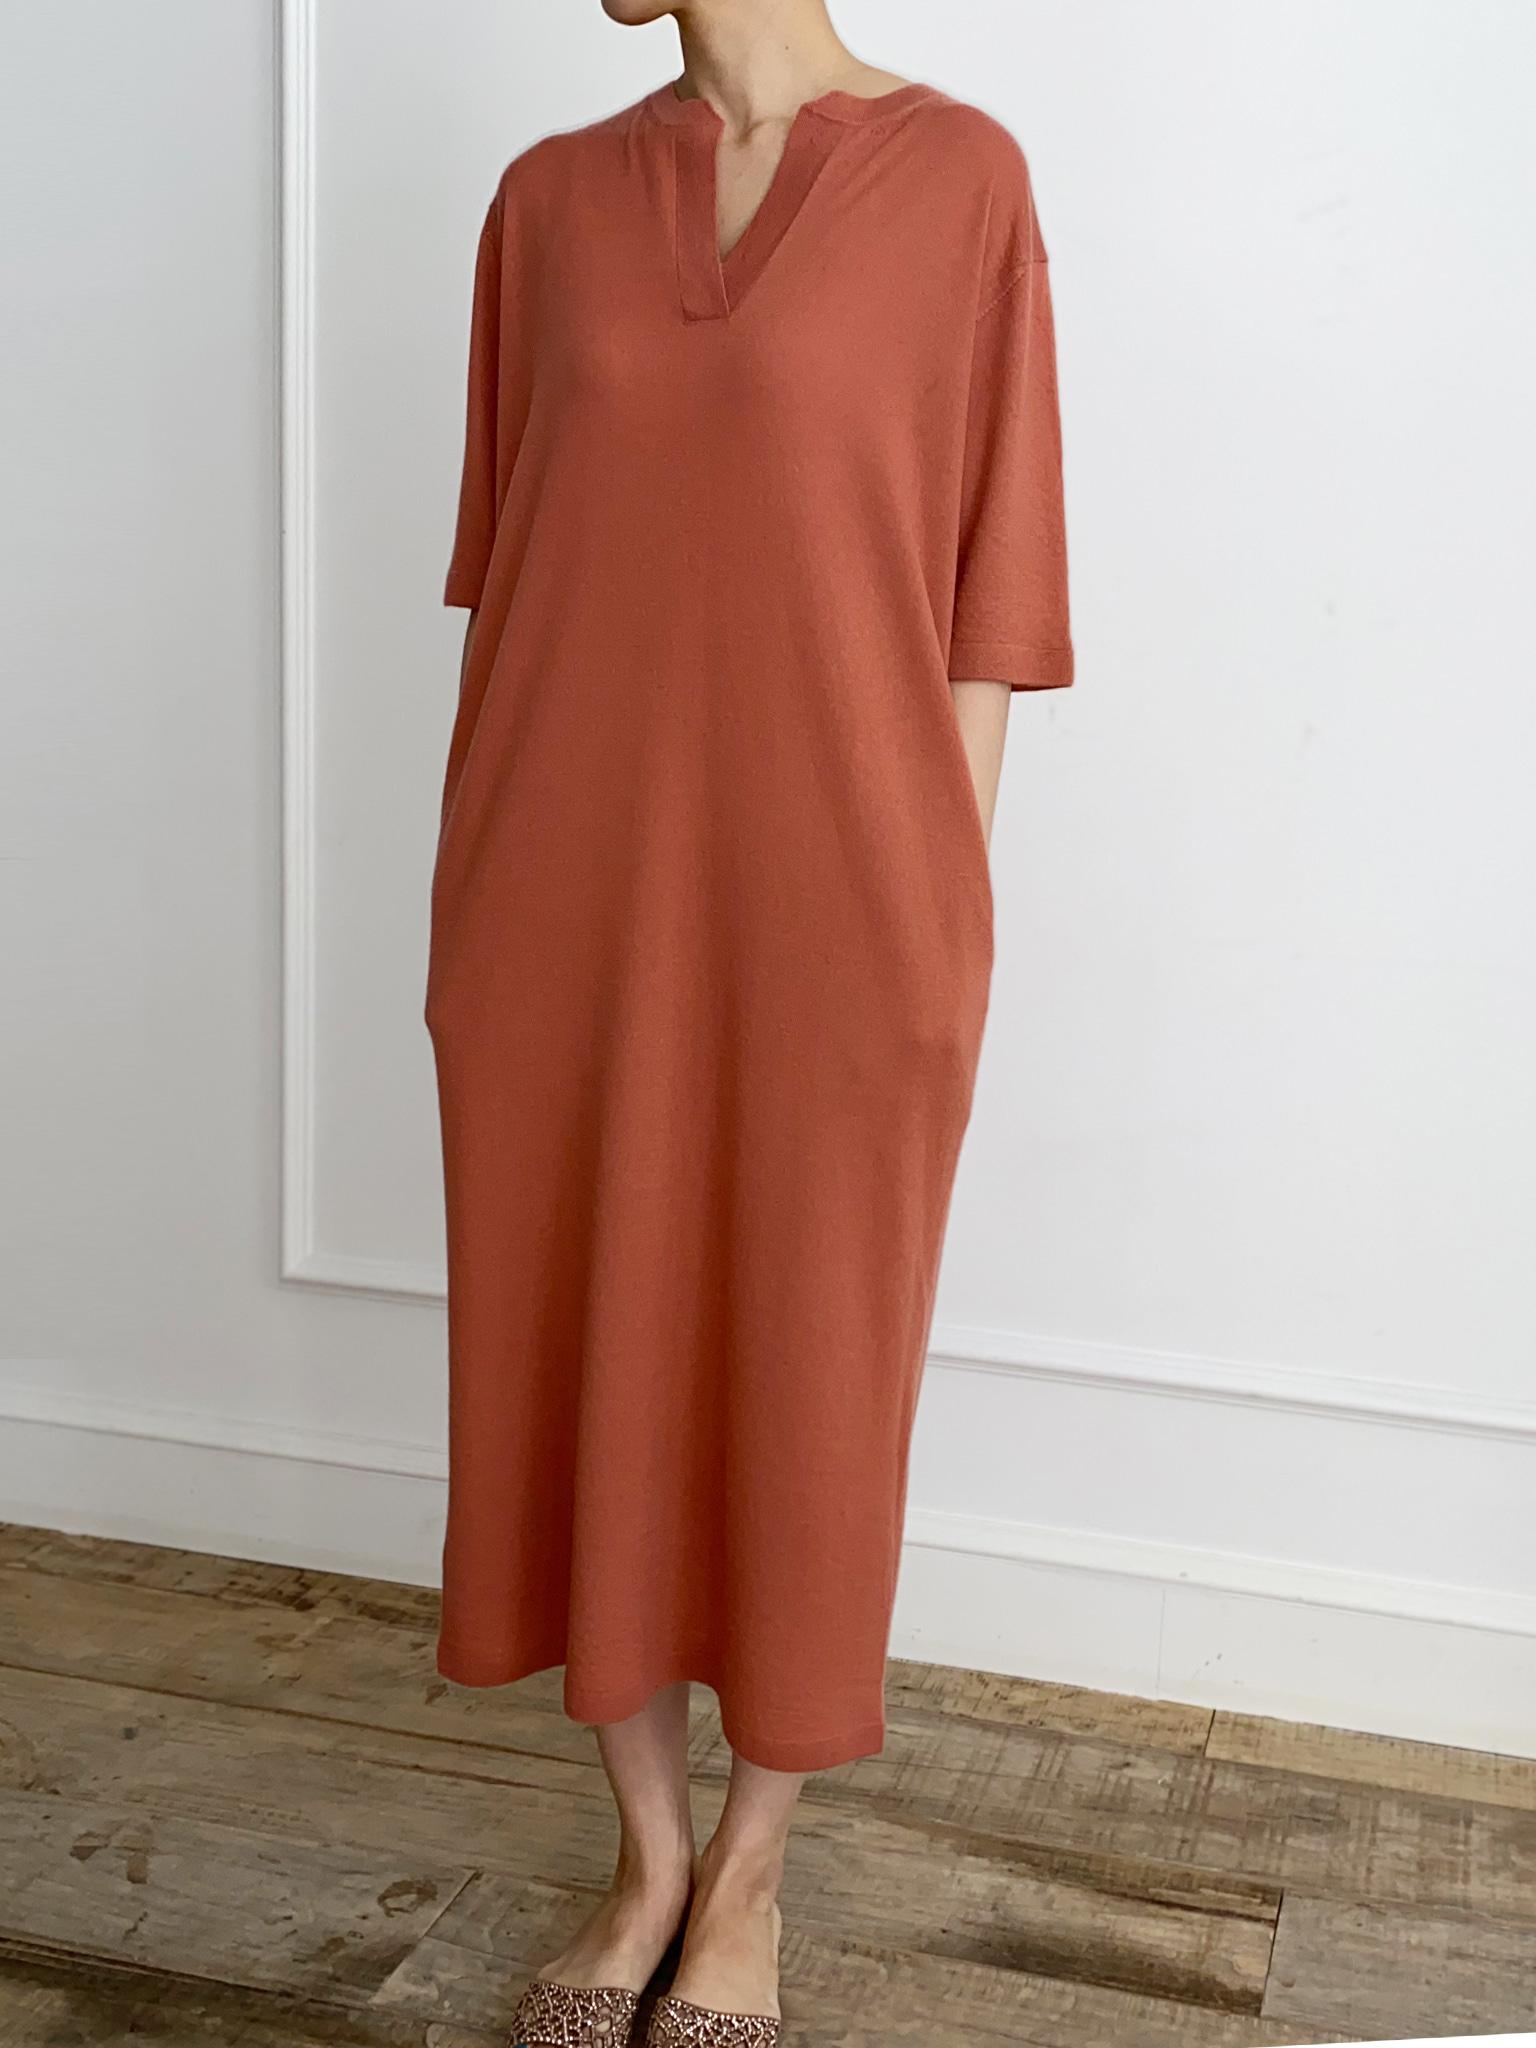 -MARE DI MARI.m-  Open Collarless Cashmere Knit Dress